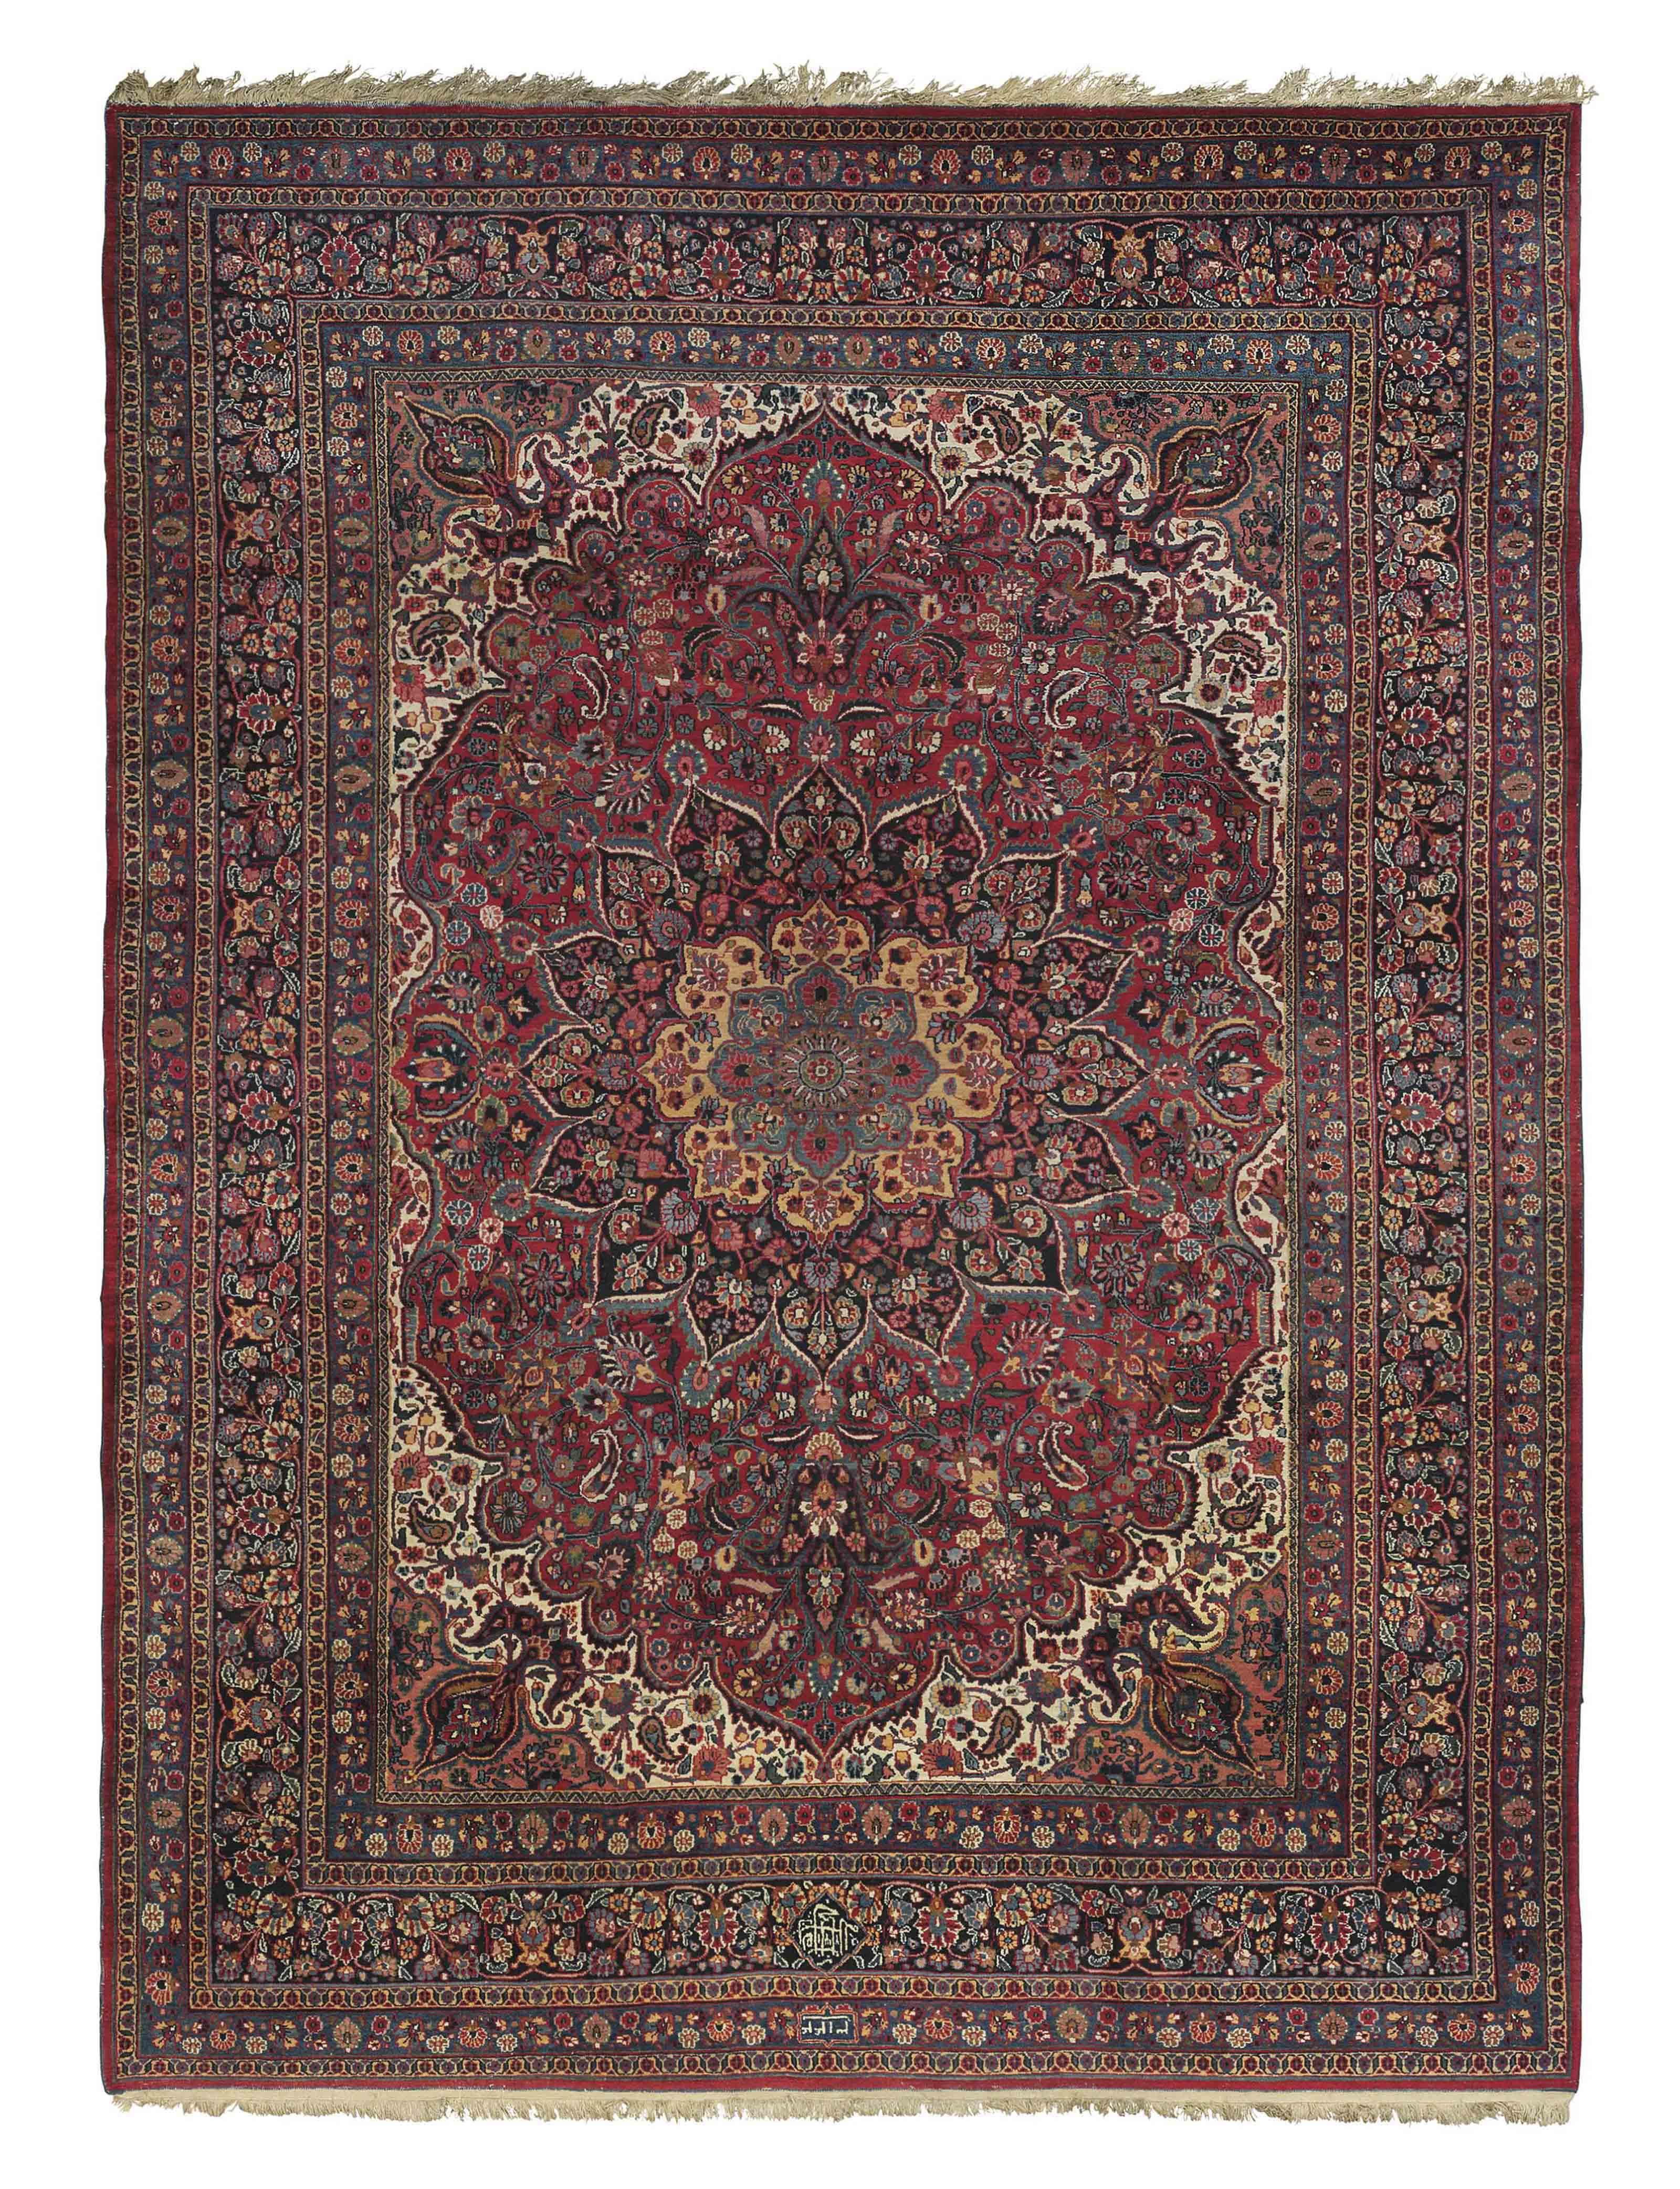 A Meshed 'Bihanian' carpet